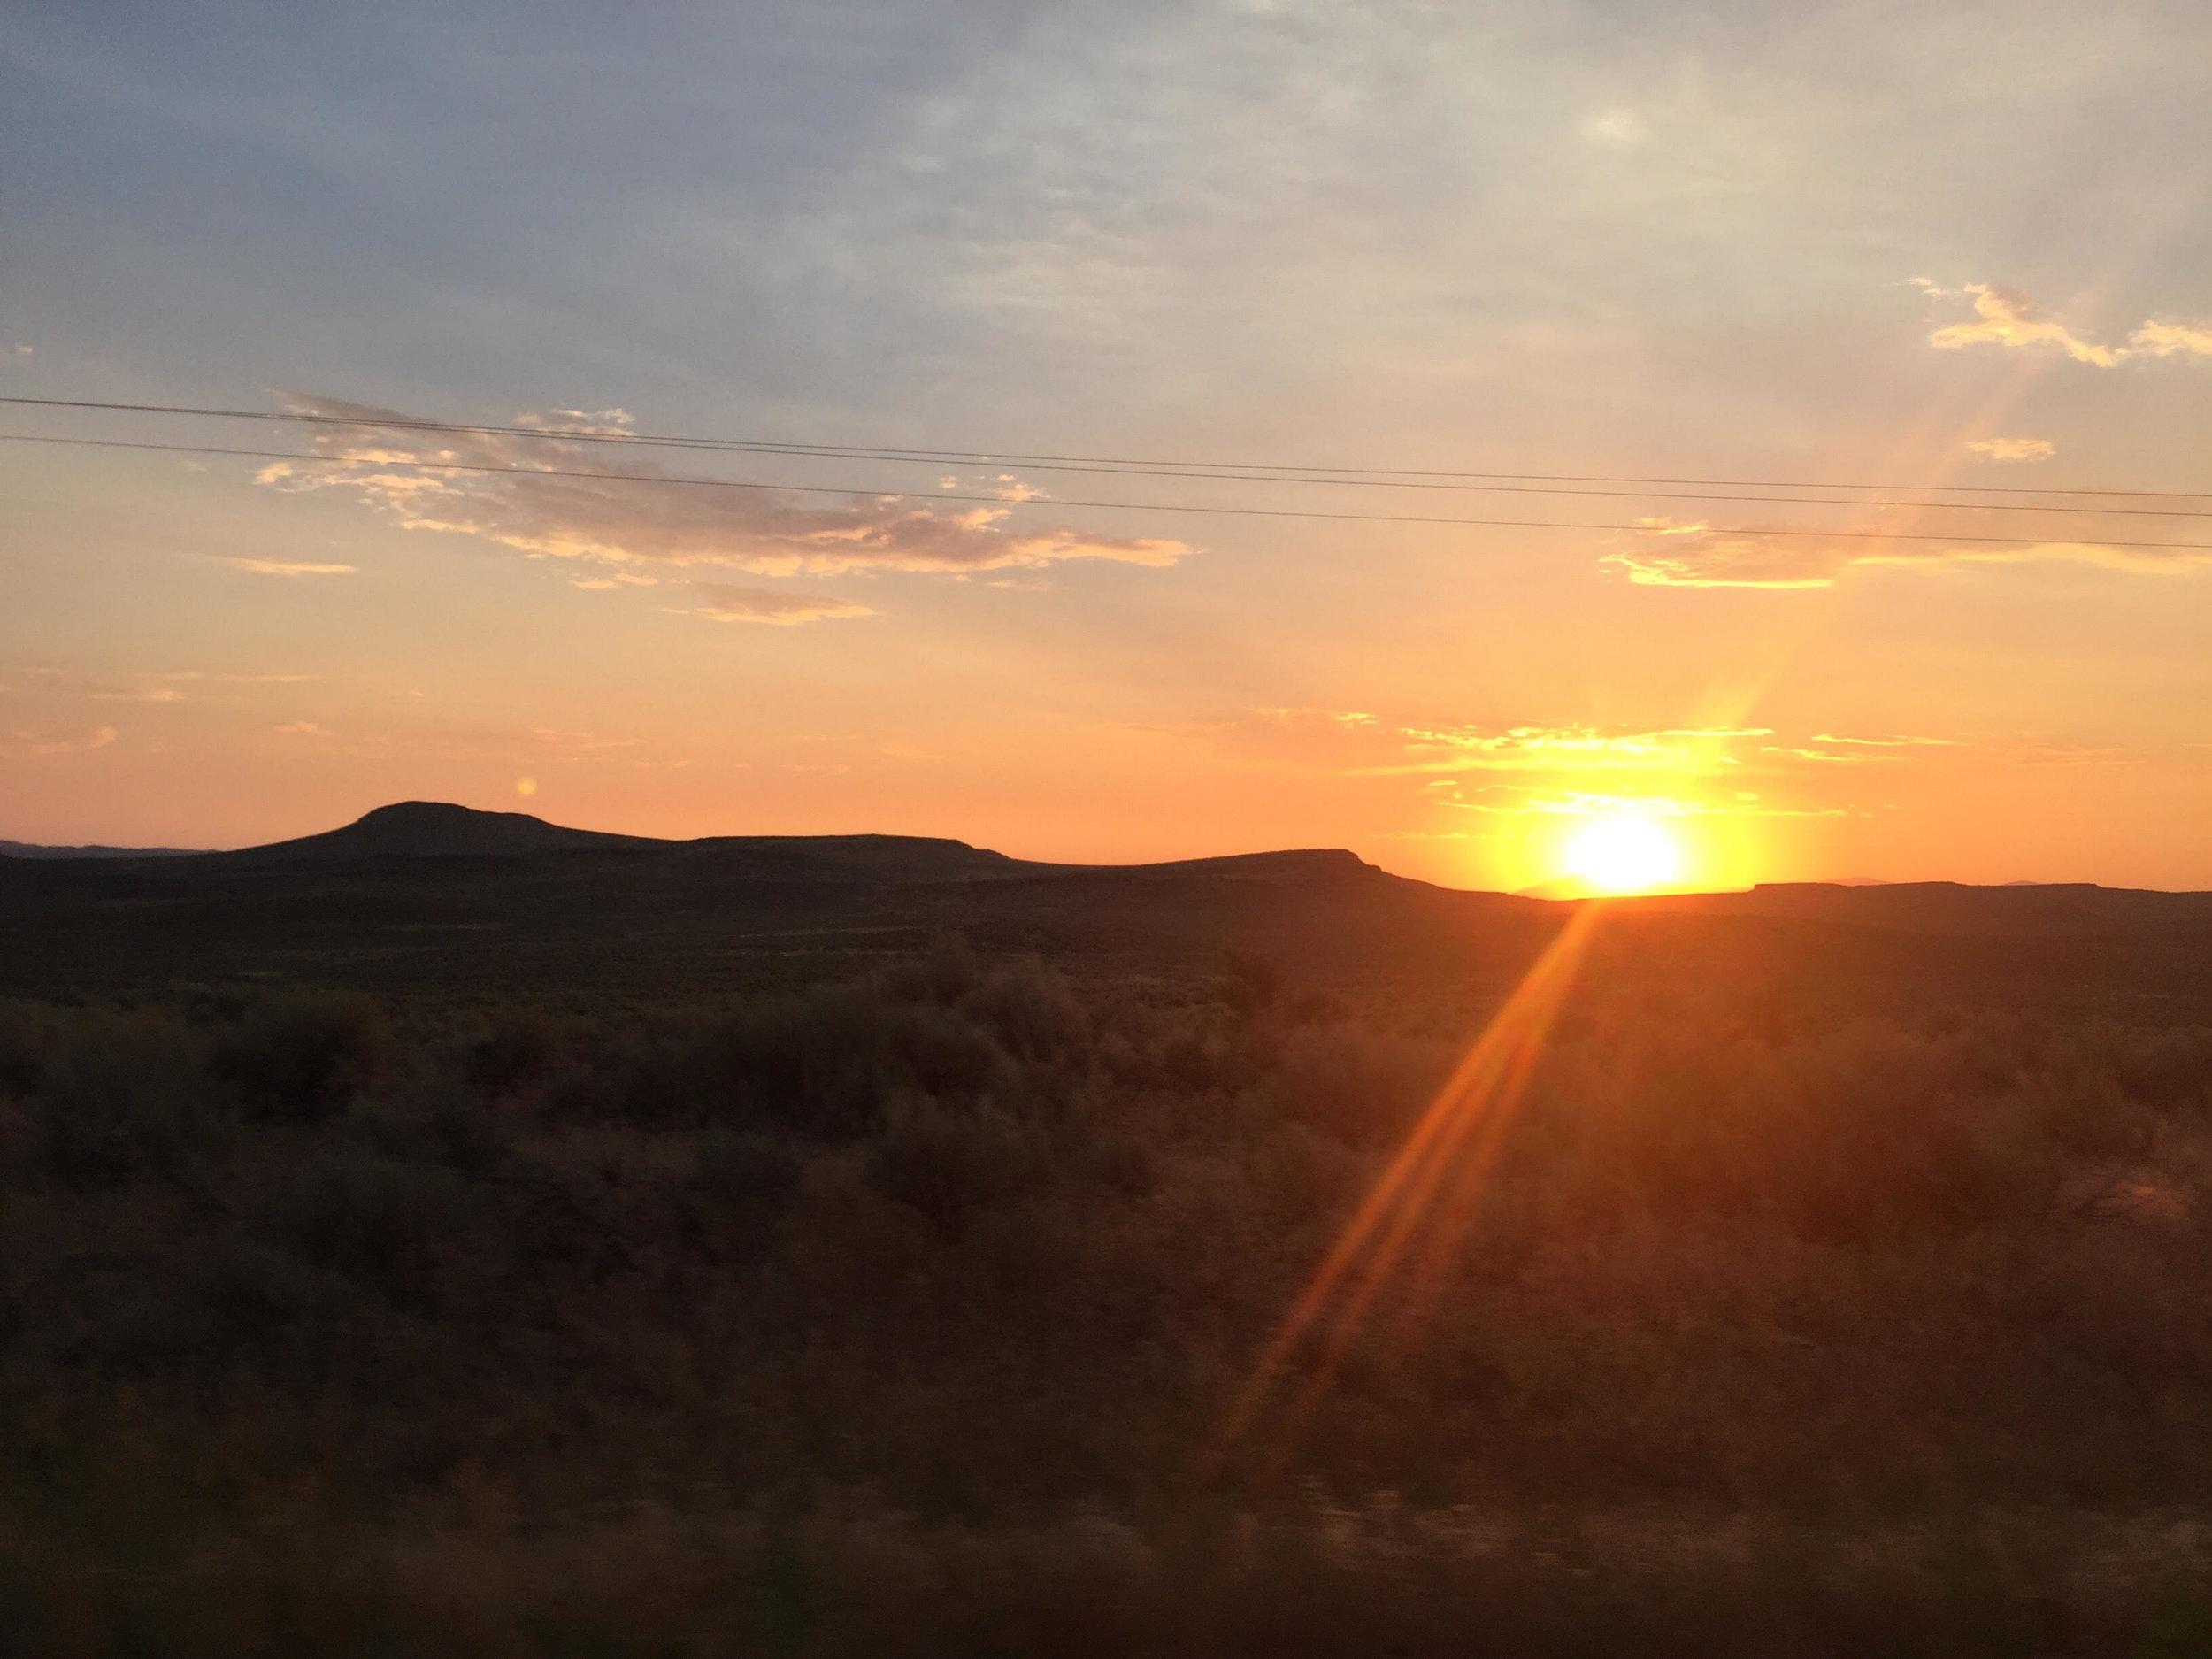 Sunset in southern Idaho - slowly, away.